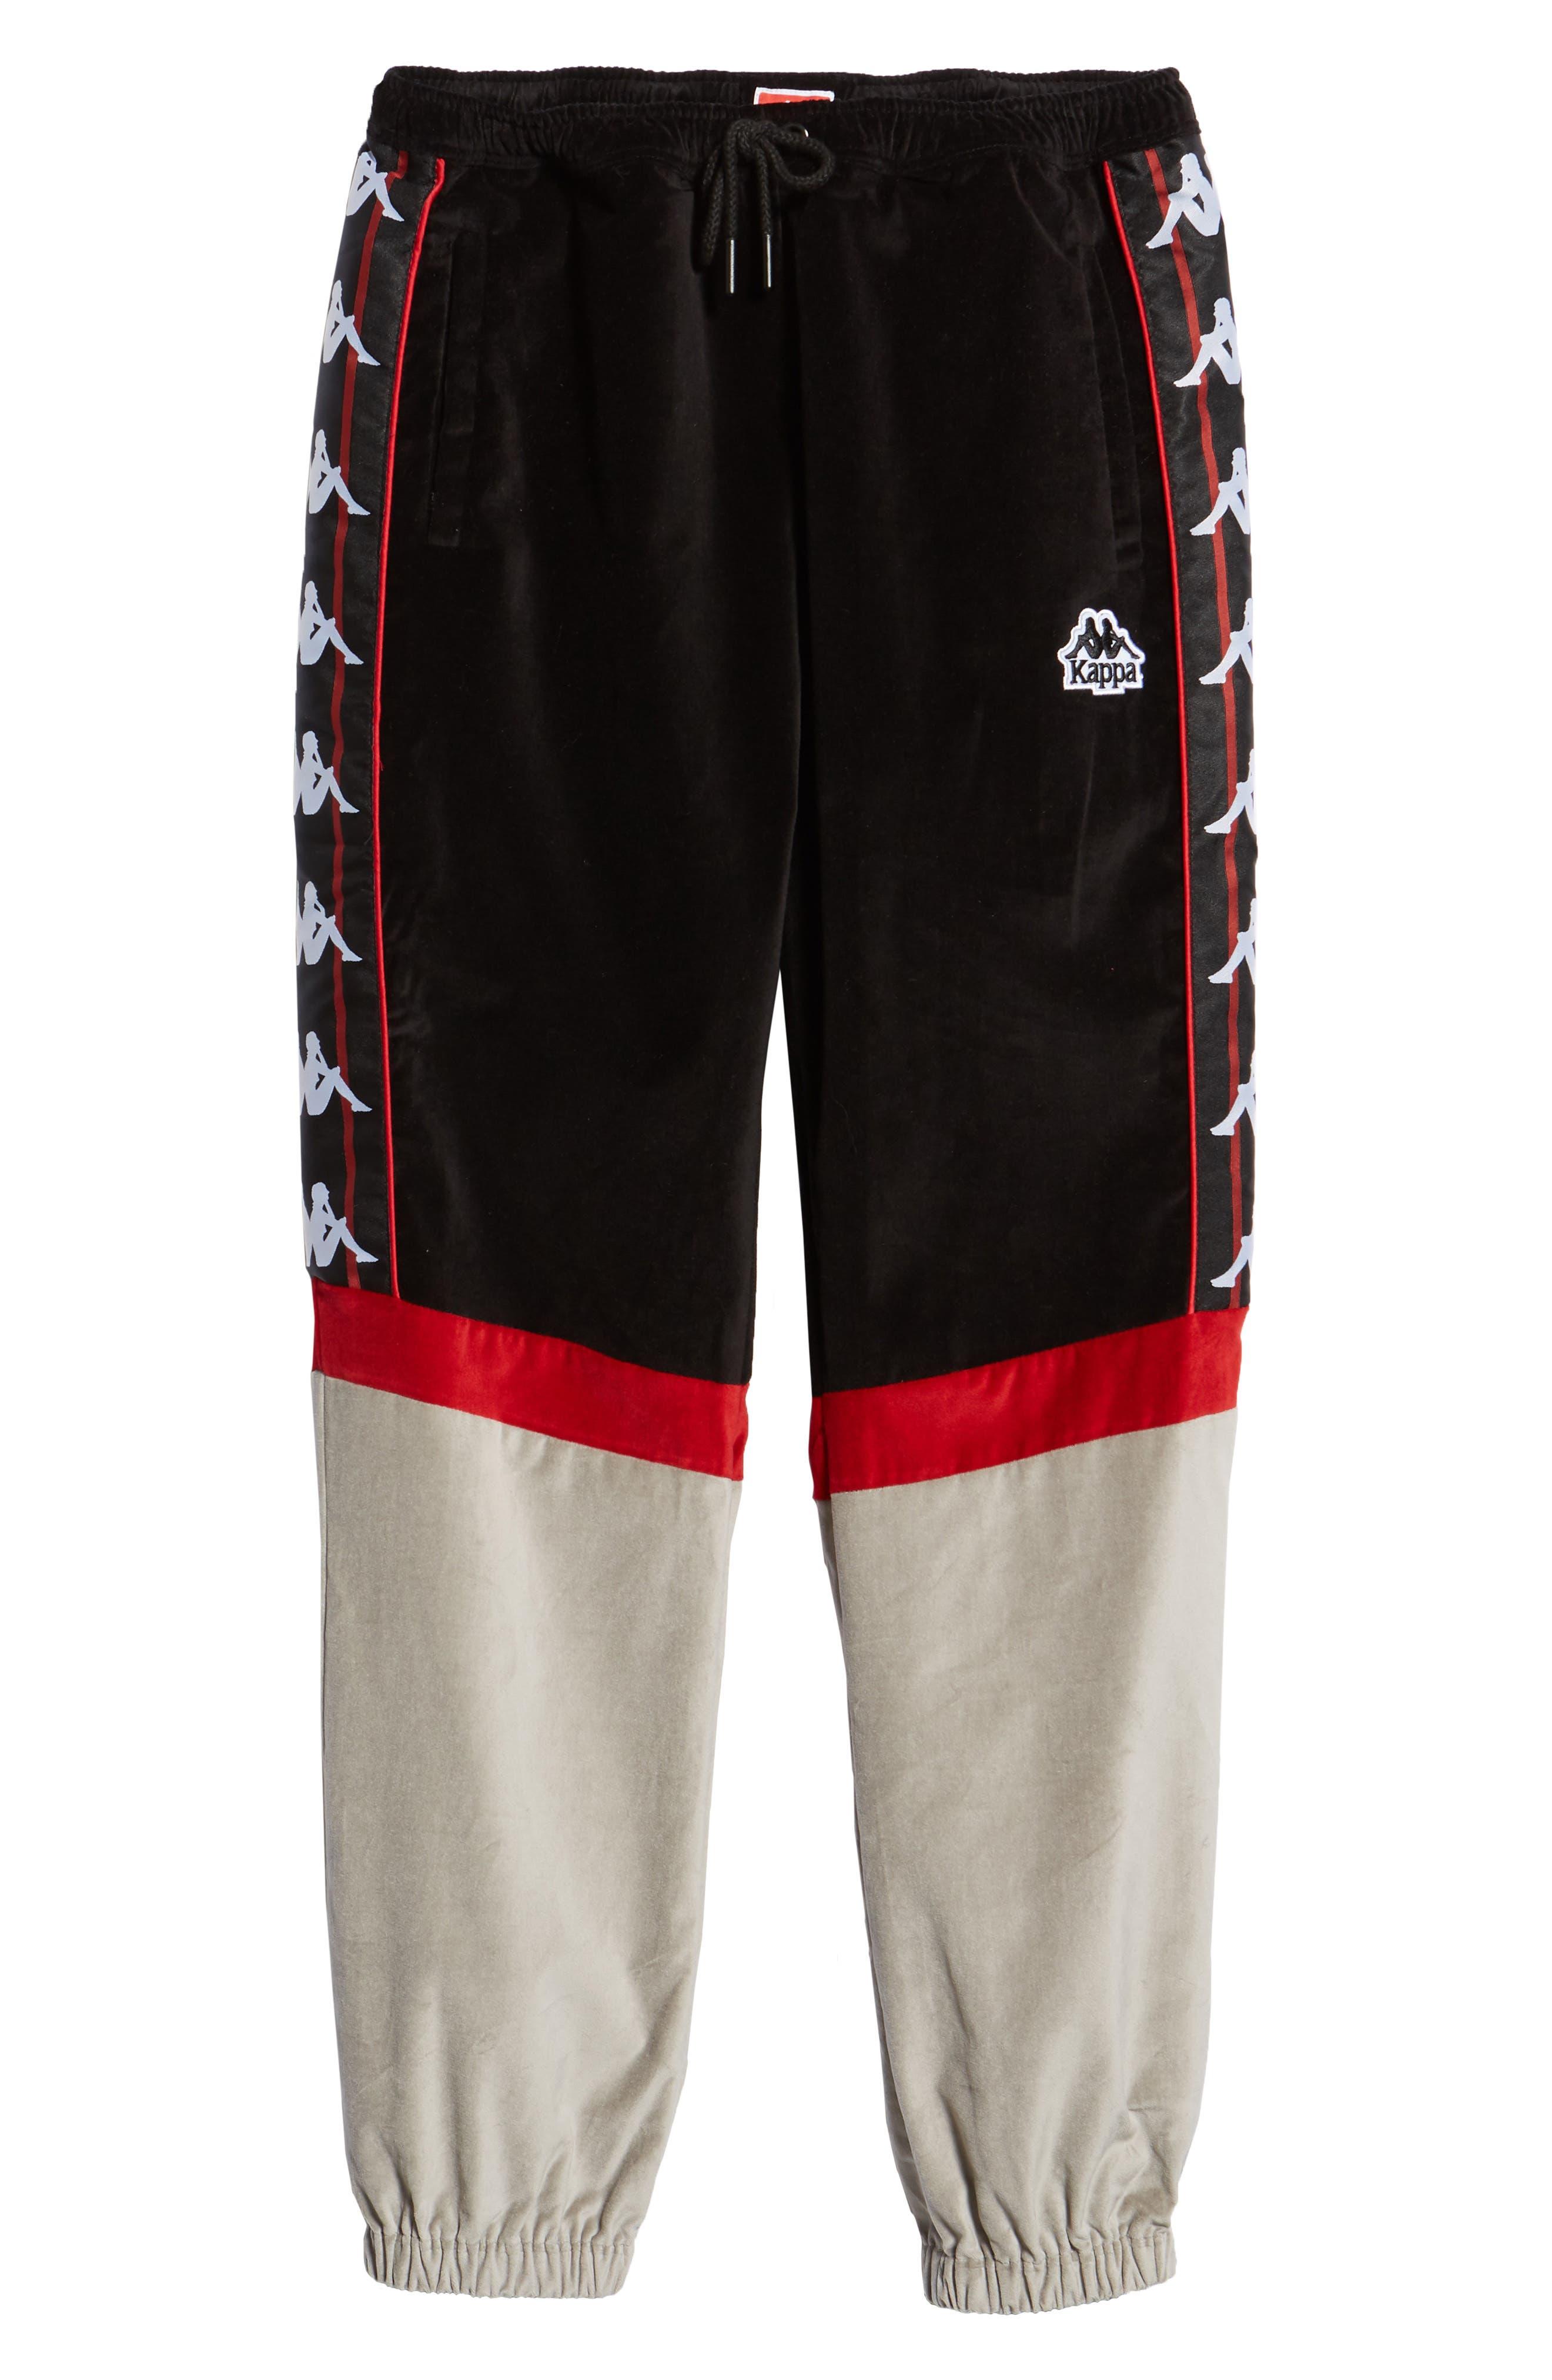 Authentic Serena Cotton Velour Track Pants,                             Alternate thumbnail 6, color,                             BLACK/ RED/ GREY